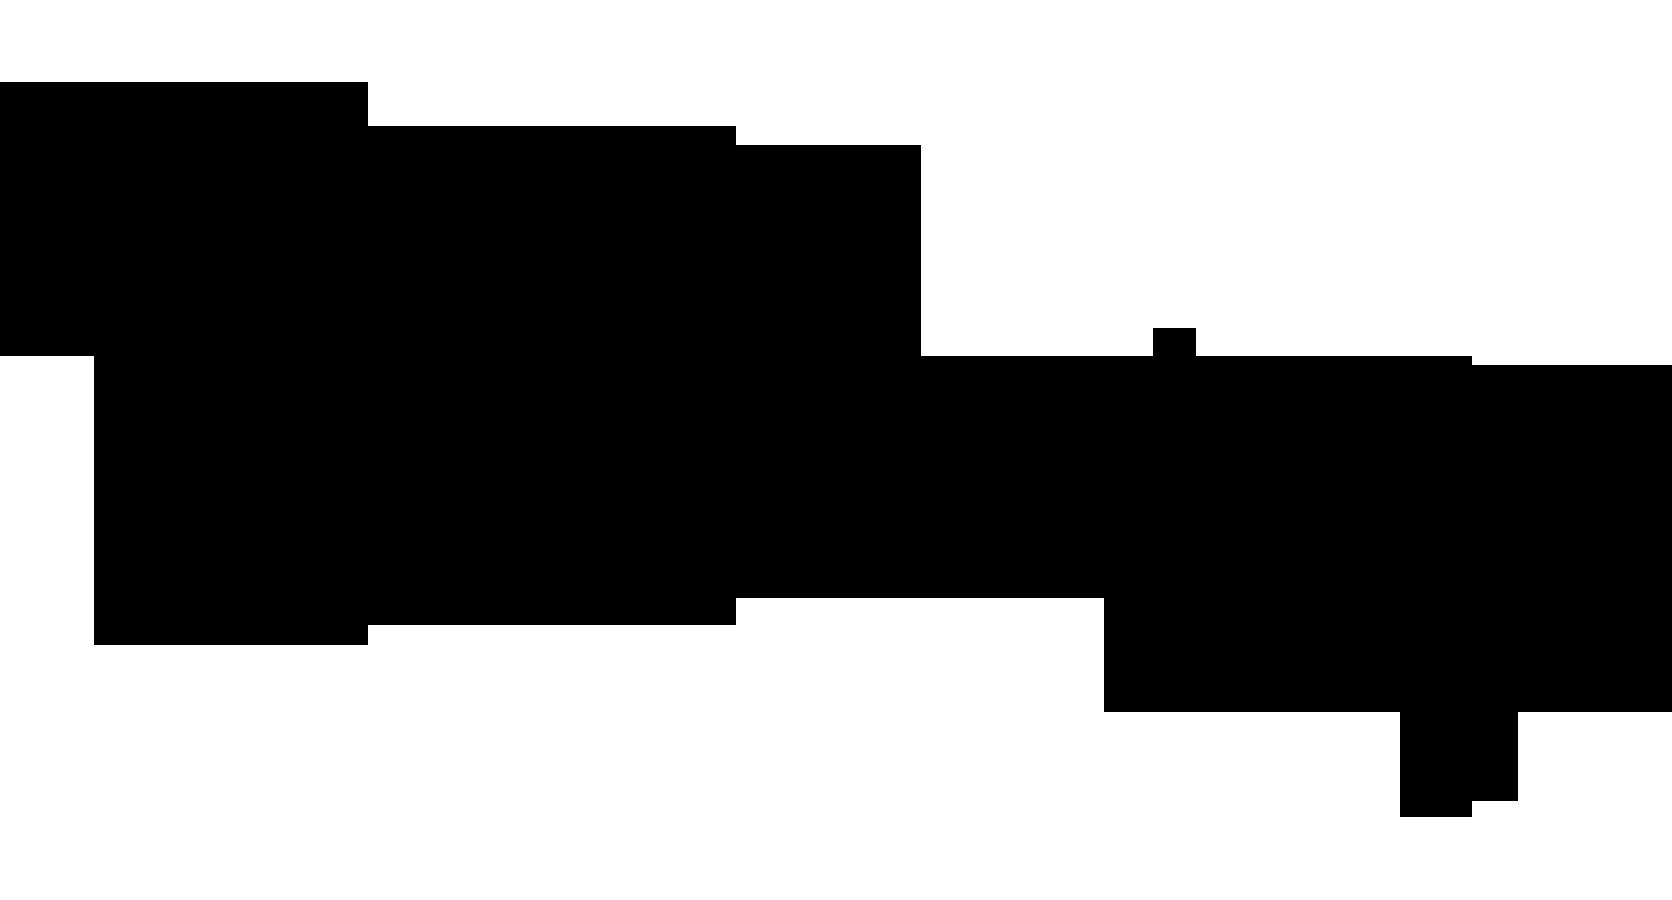 Disney logo vector - Fotolip.com Rich image and wallpaper